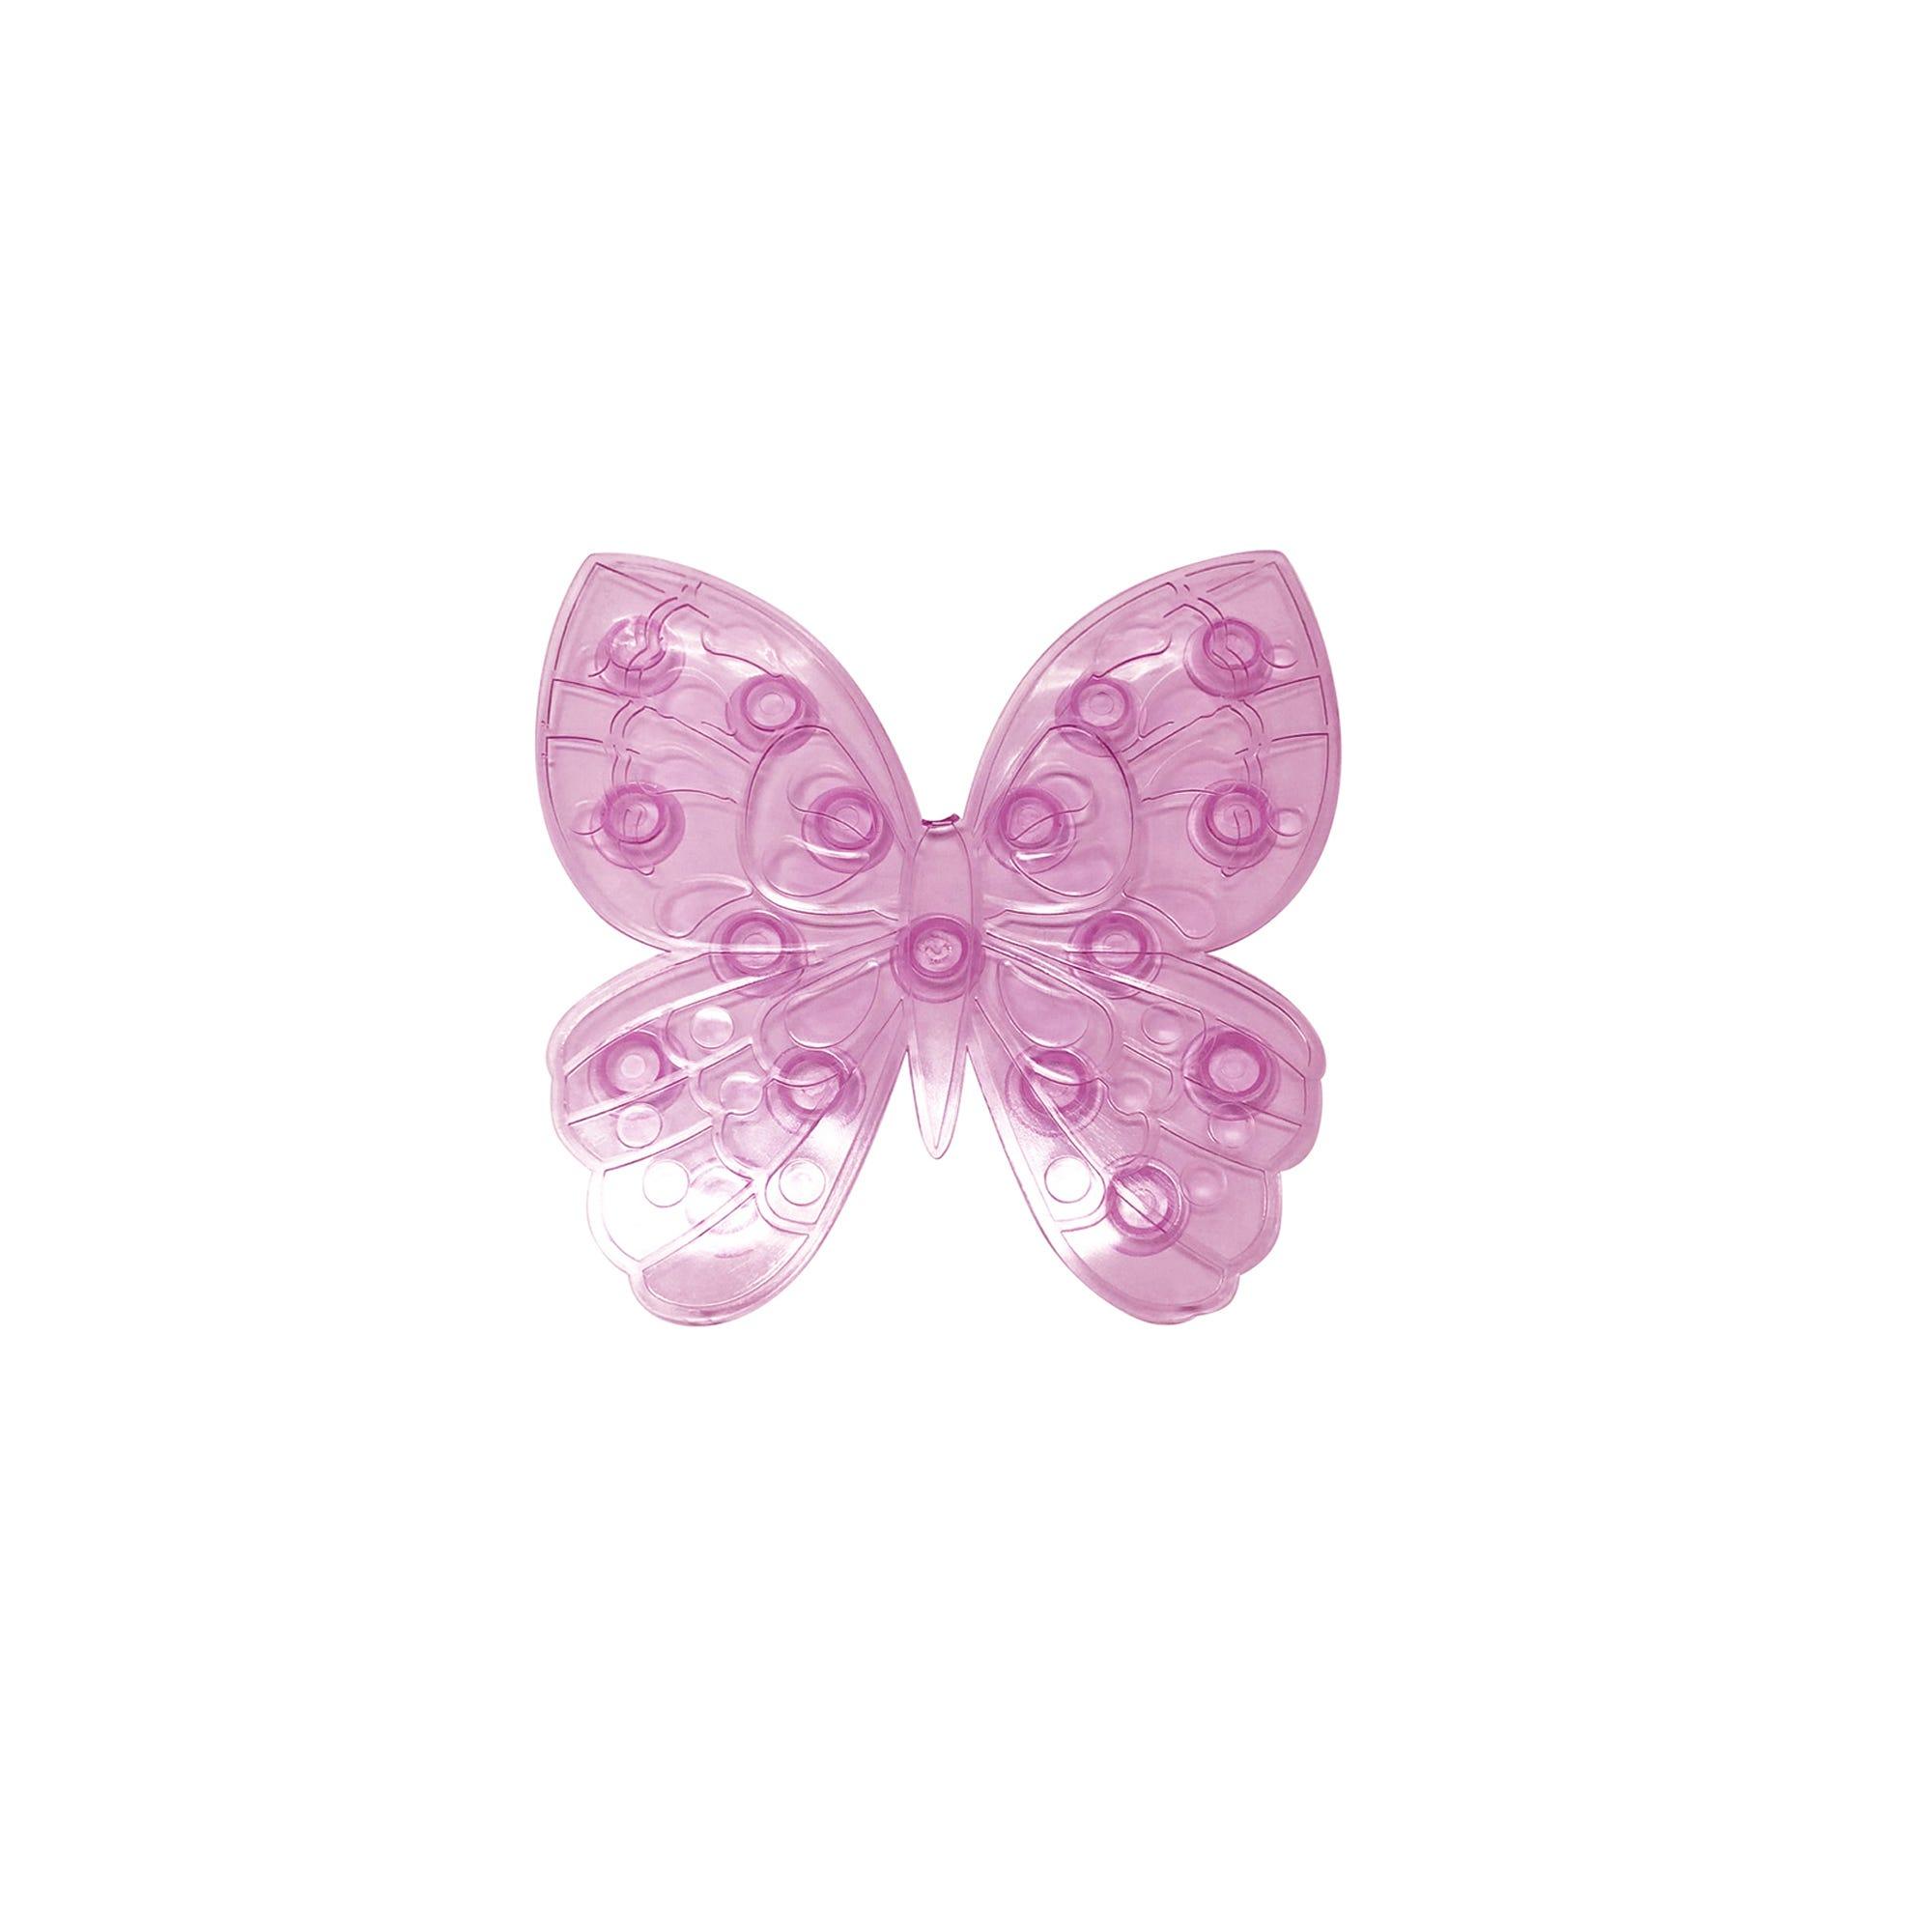 Mariposas antiderrapantes para regadera Namaro Design™, Set de 6